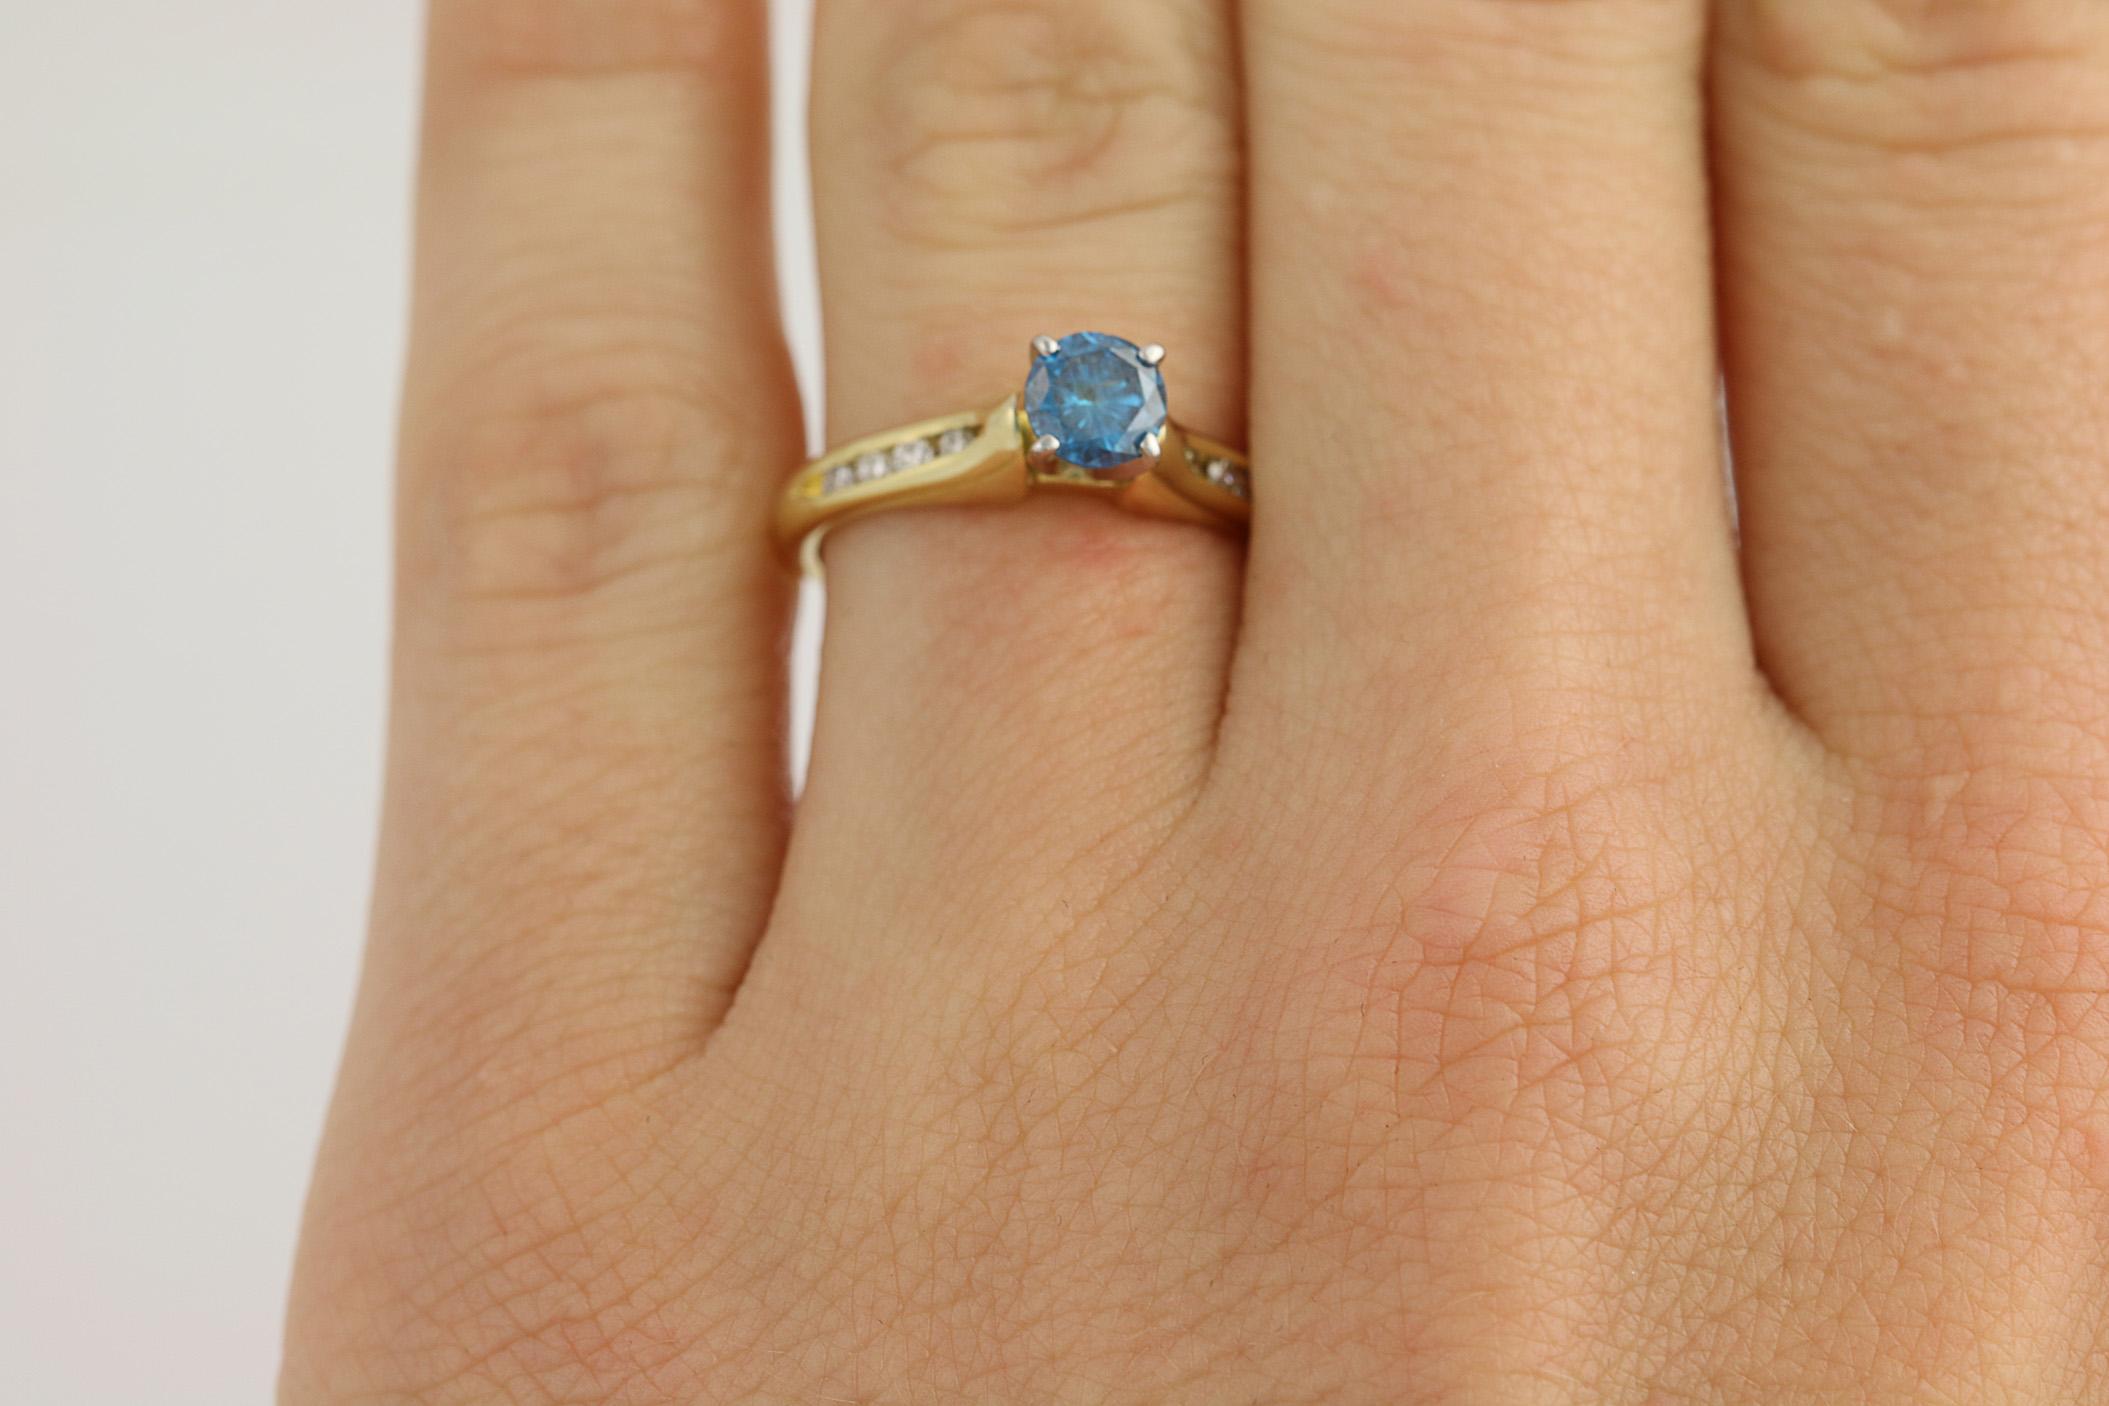 Blau weiss diamant verlobungsring 18k gelbgold - Verlobungsring blau ...